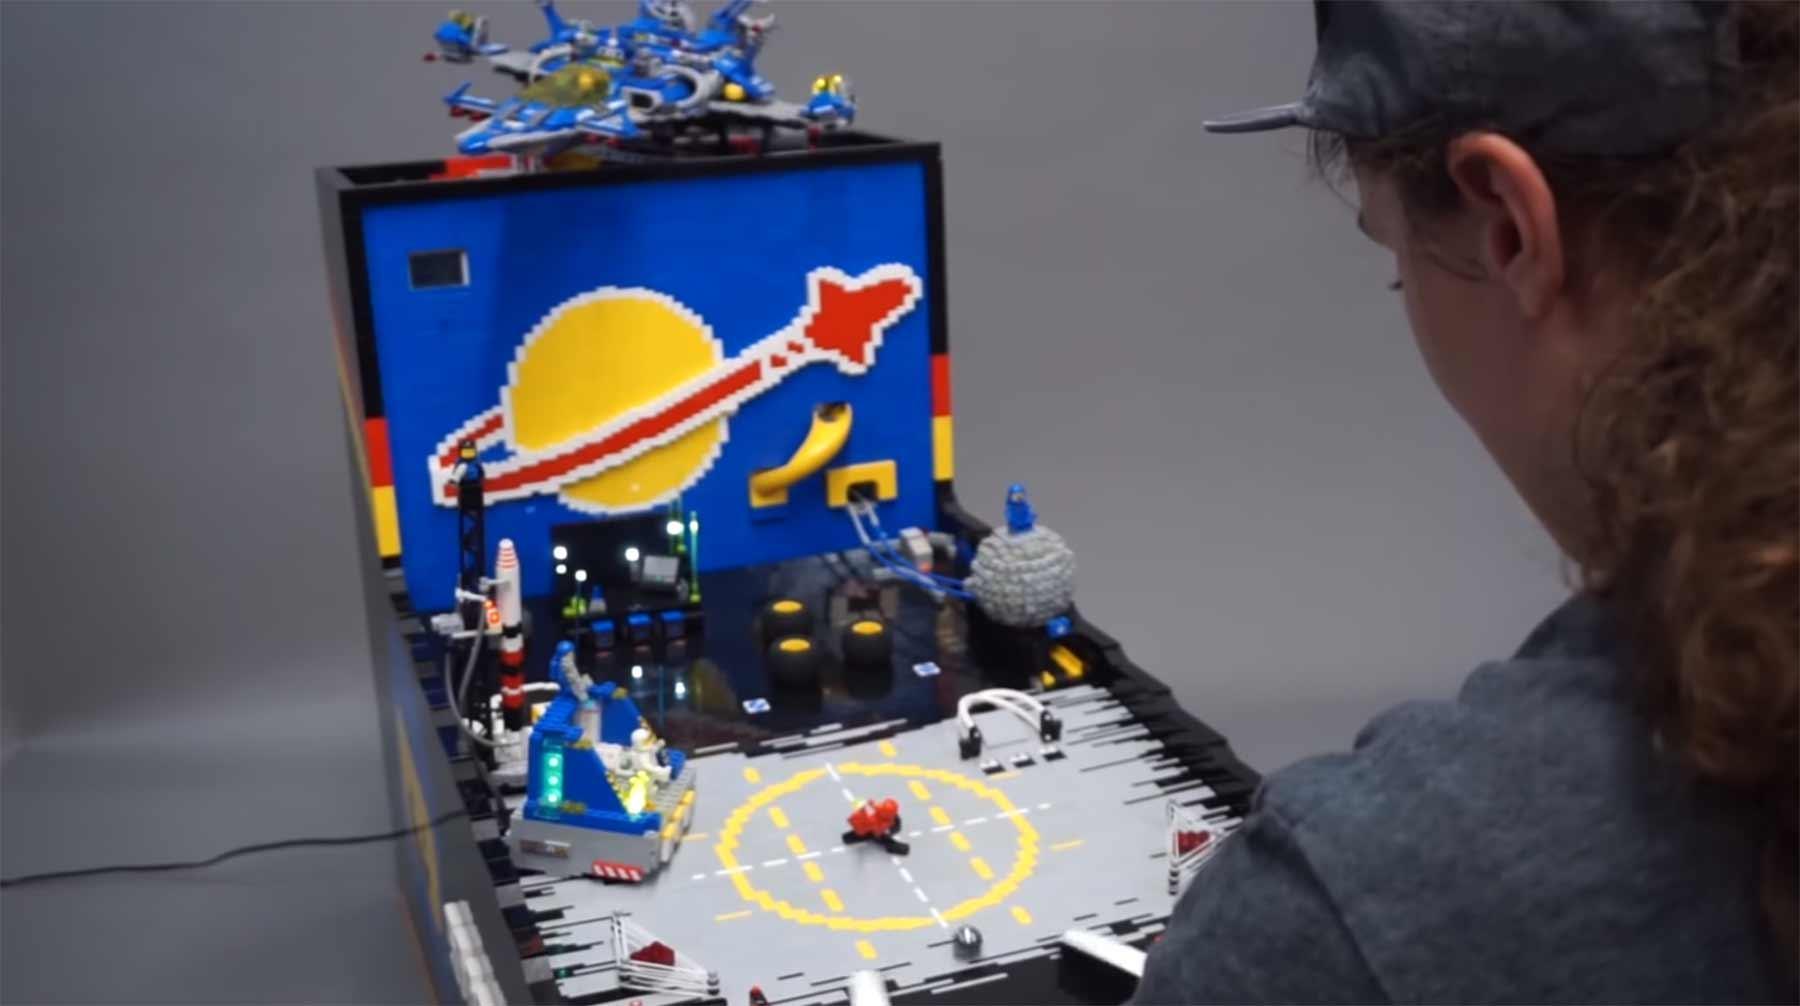 Pinball-Maschine aus LEGO pinball-maschine-aus-lego